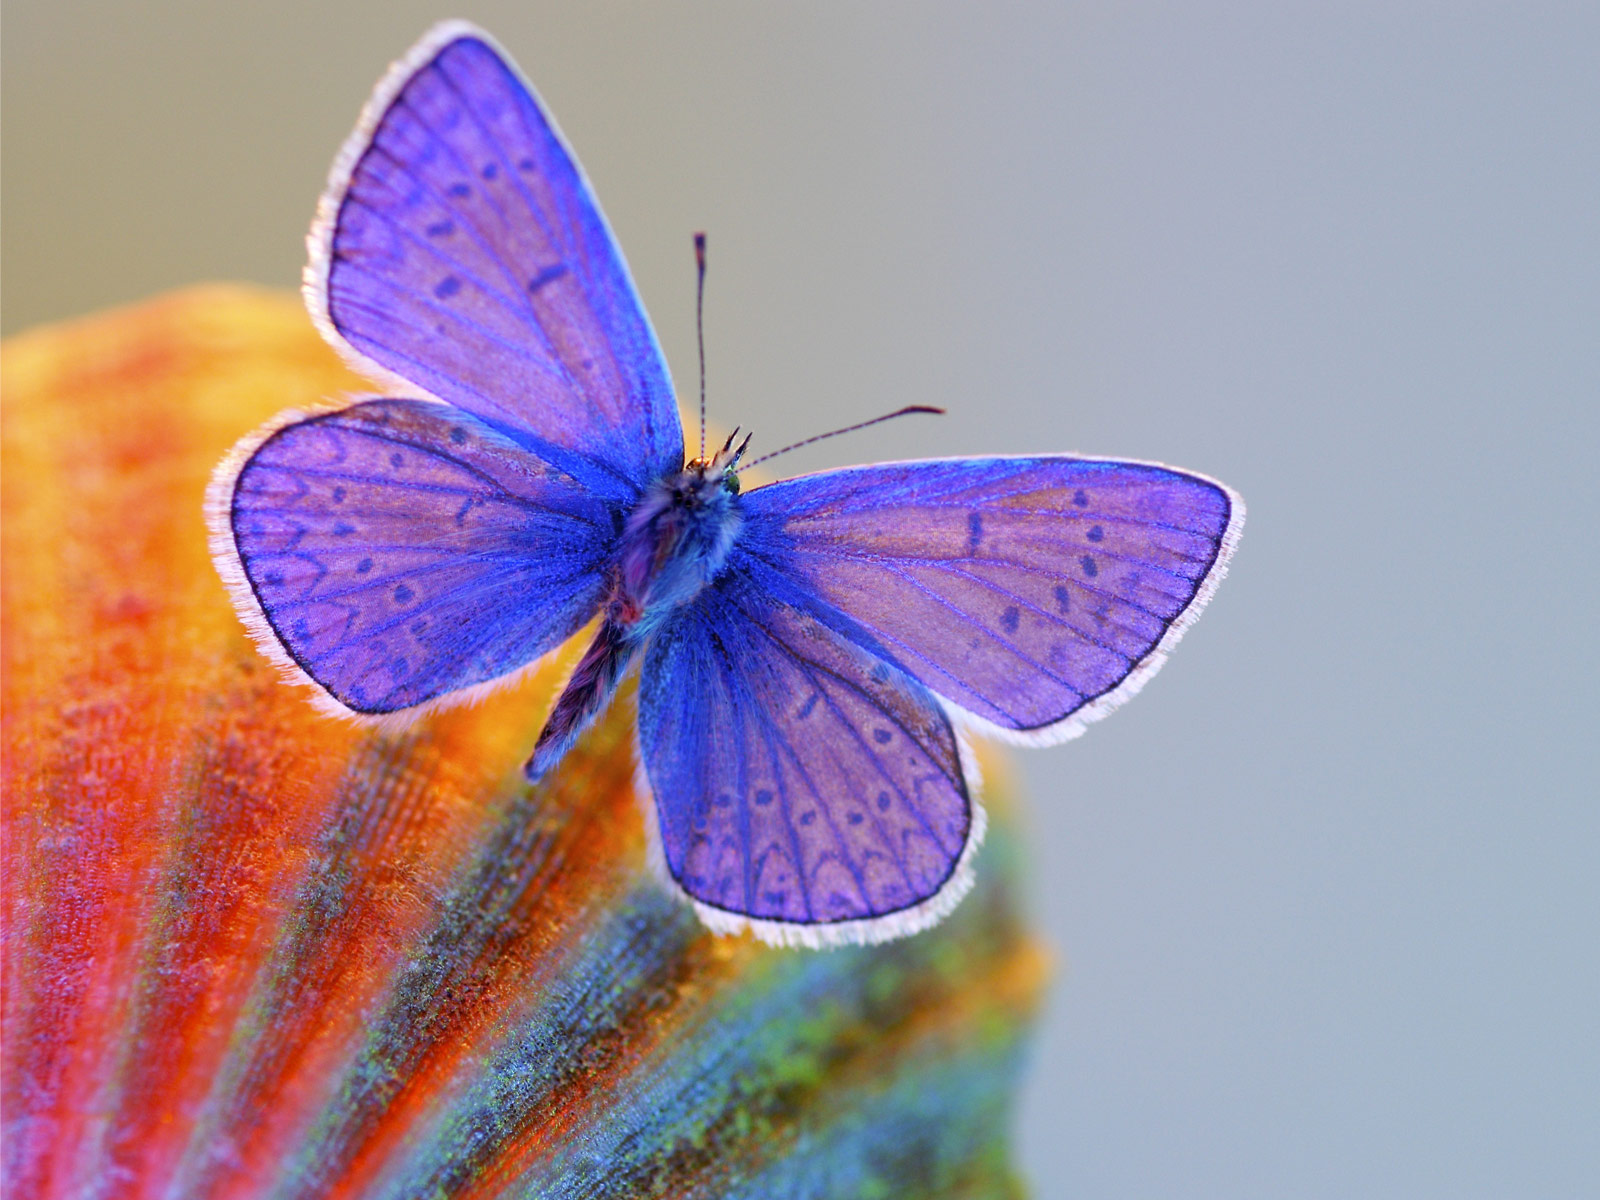 Hd Butterfly Wallpapers - Xerces Blue Butterfly , HD Wallpaper & Backgrounds